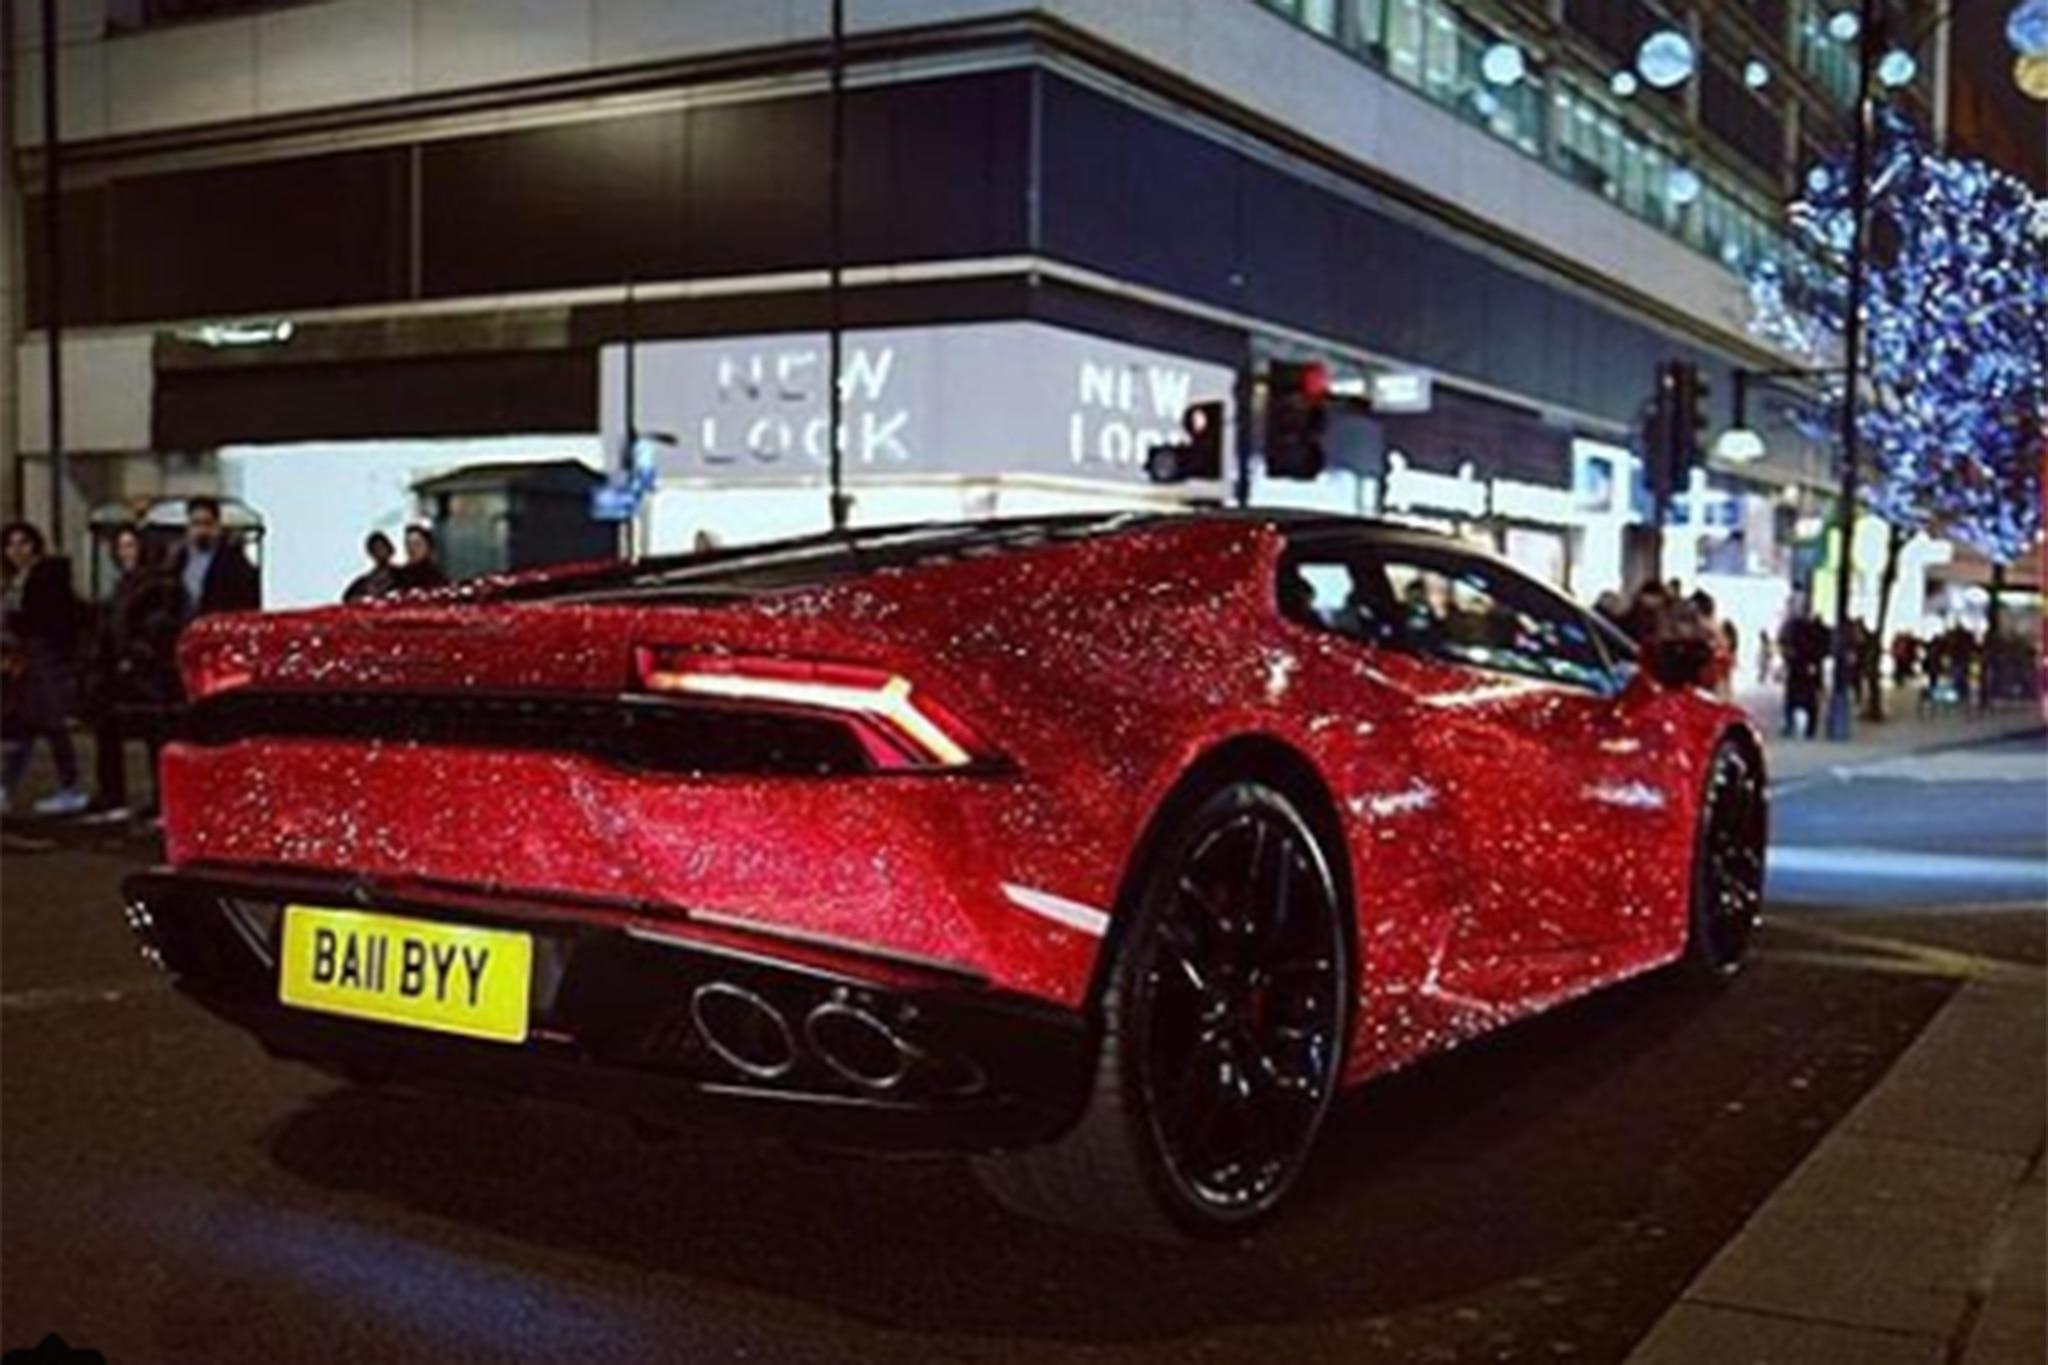 Crystal Encrusted Lamborghini Hurac 225 N Spotted On London Streets Automobile Magazine